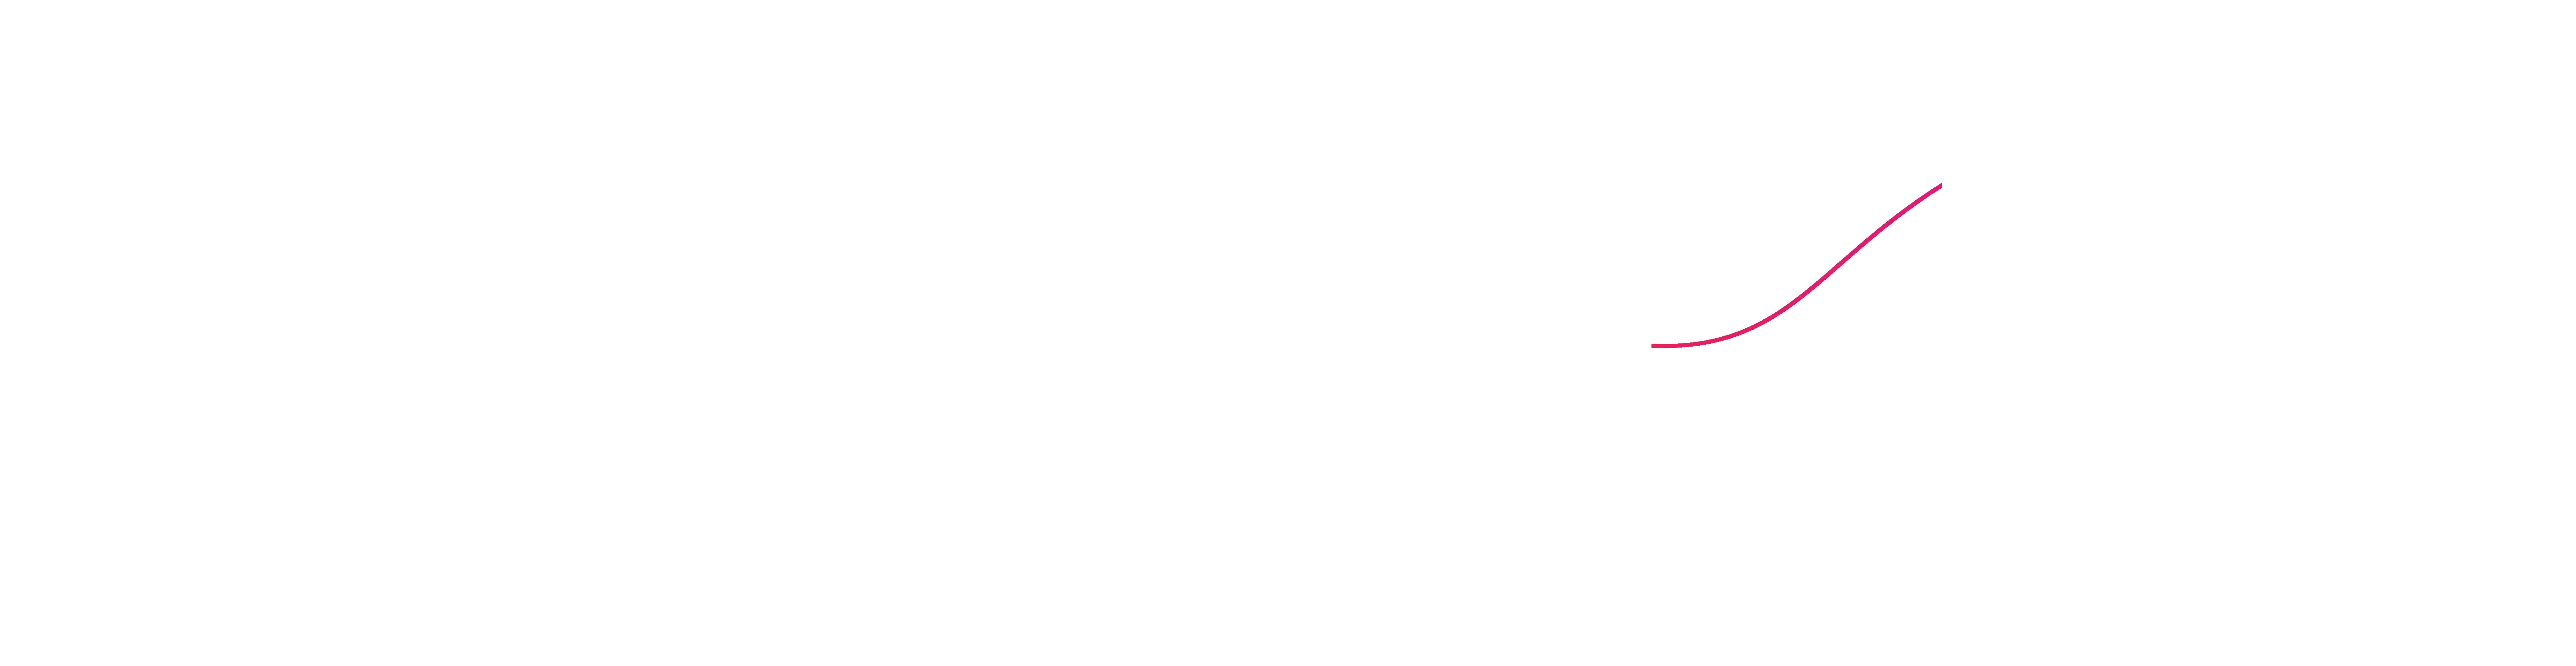 line4.png